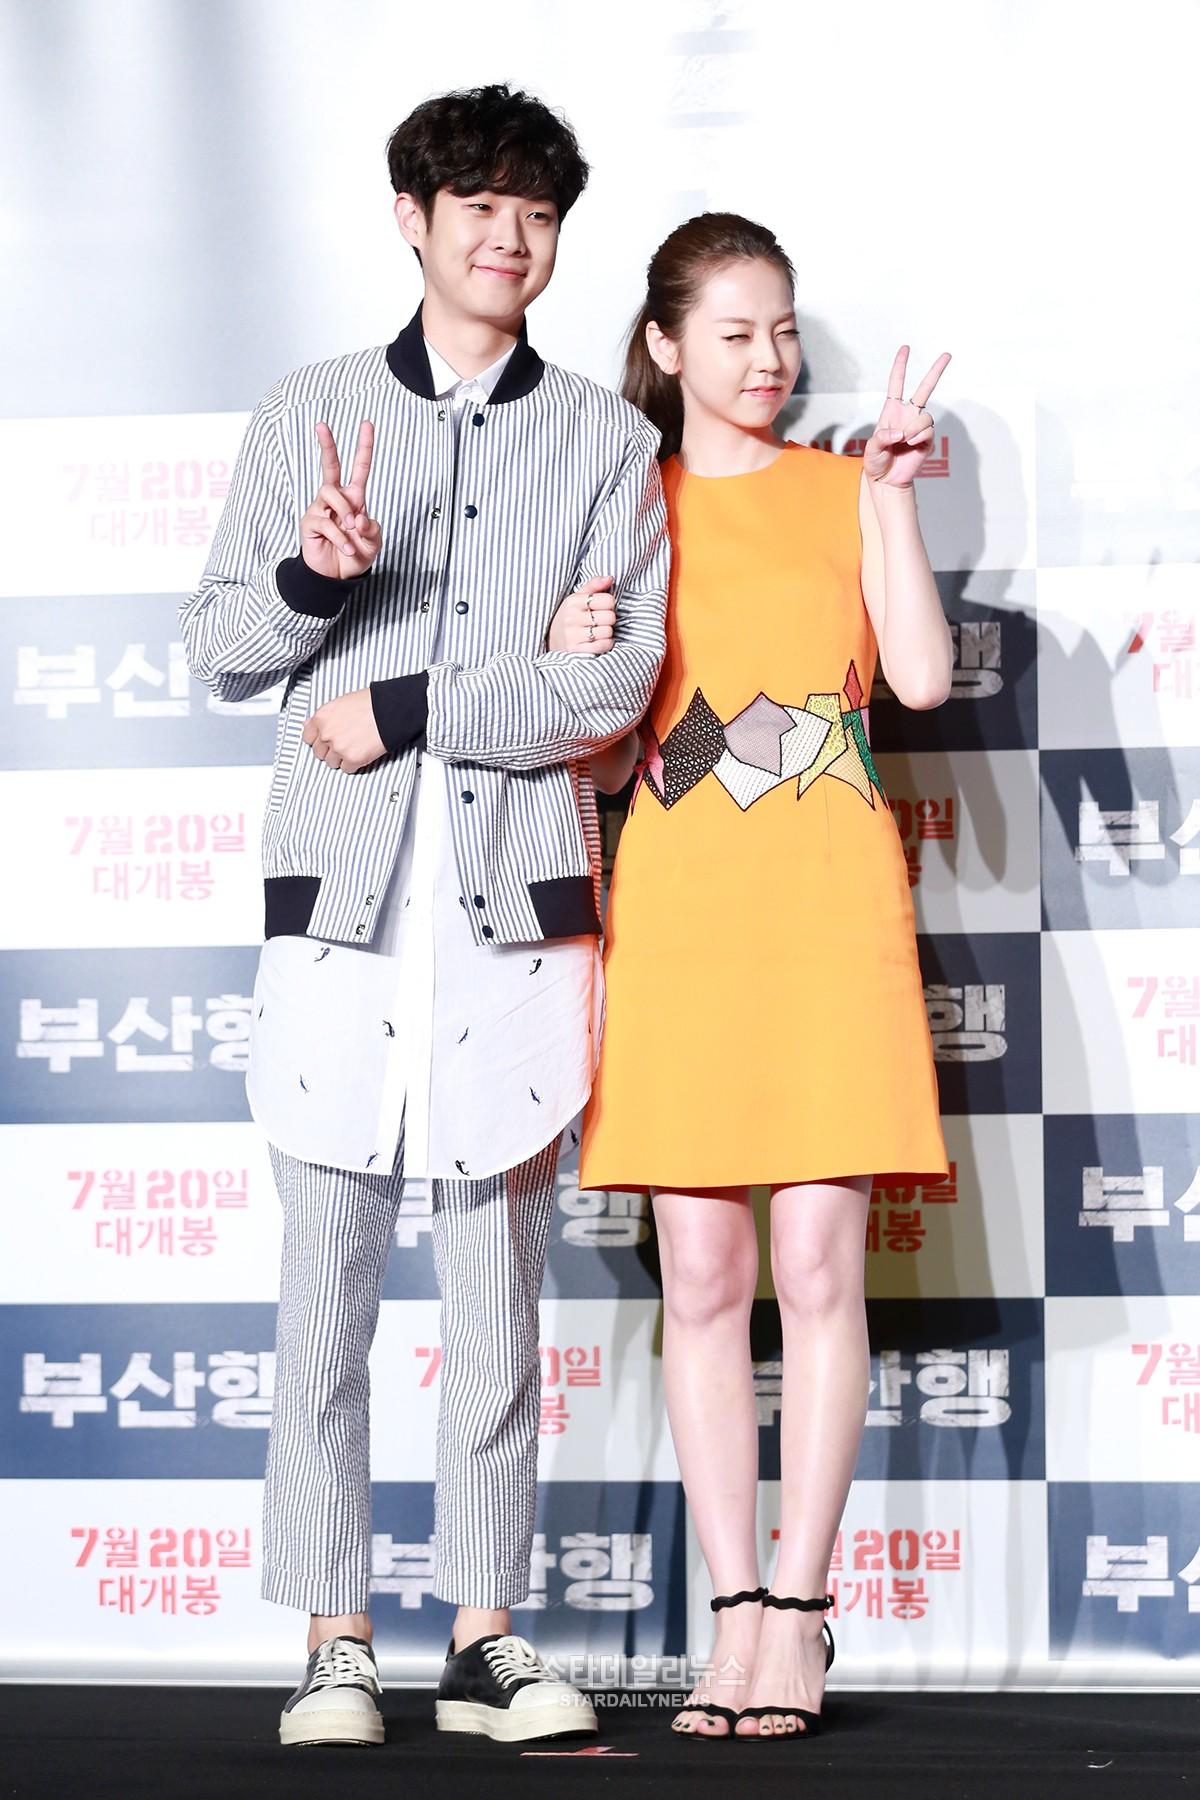 Choi Woo Shik Is Full Of Praise For Co-Star Ahn Sohee (And Himself?)